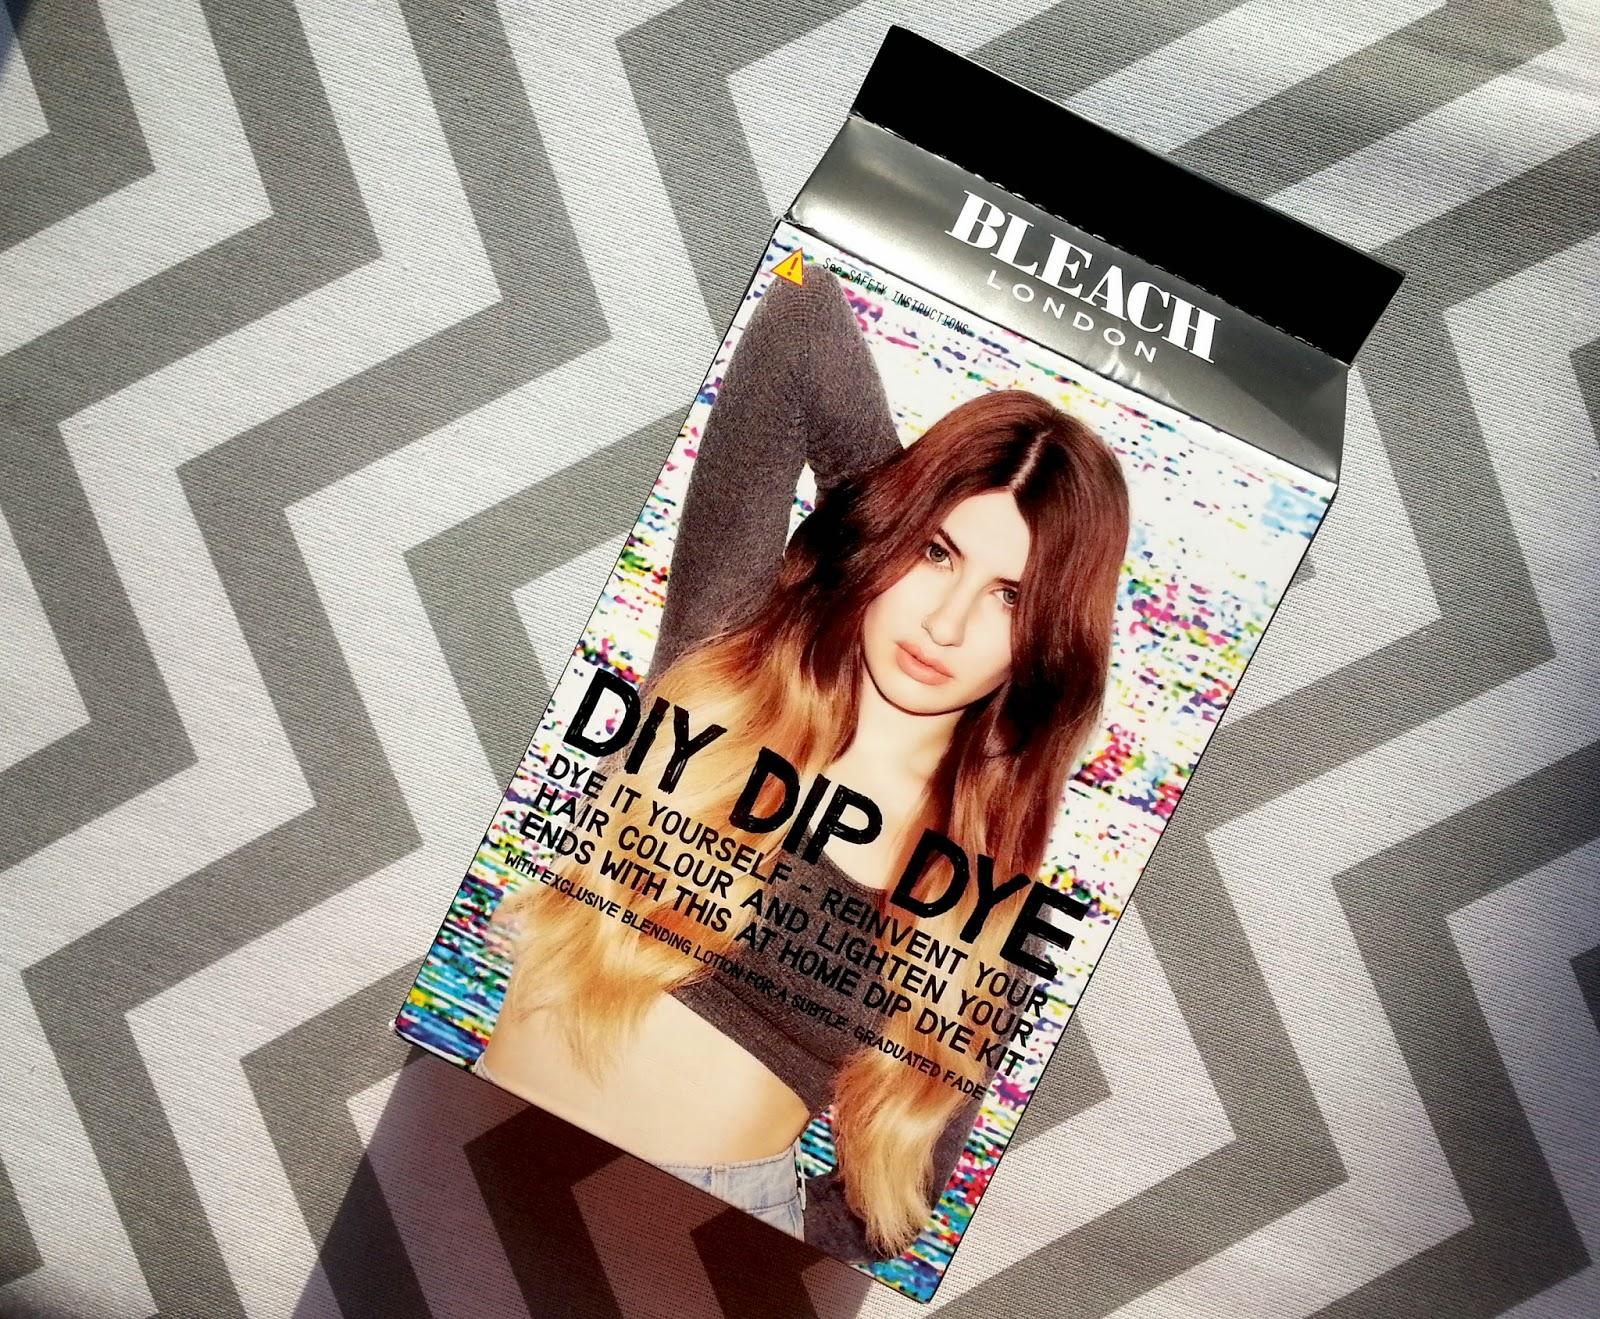 Bleach London DIY Dip Dye Review Before After